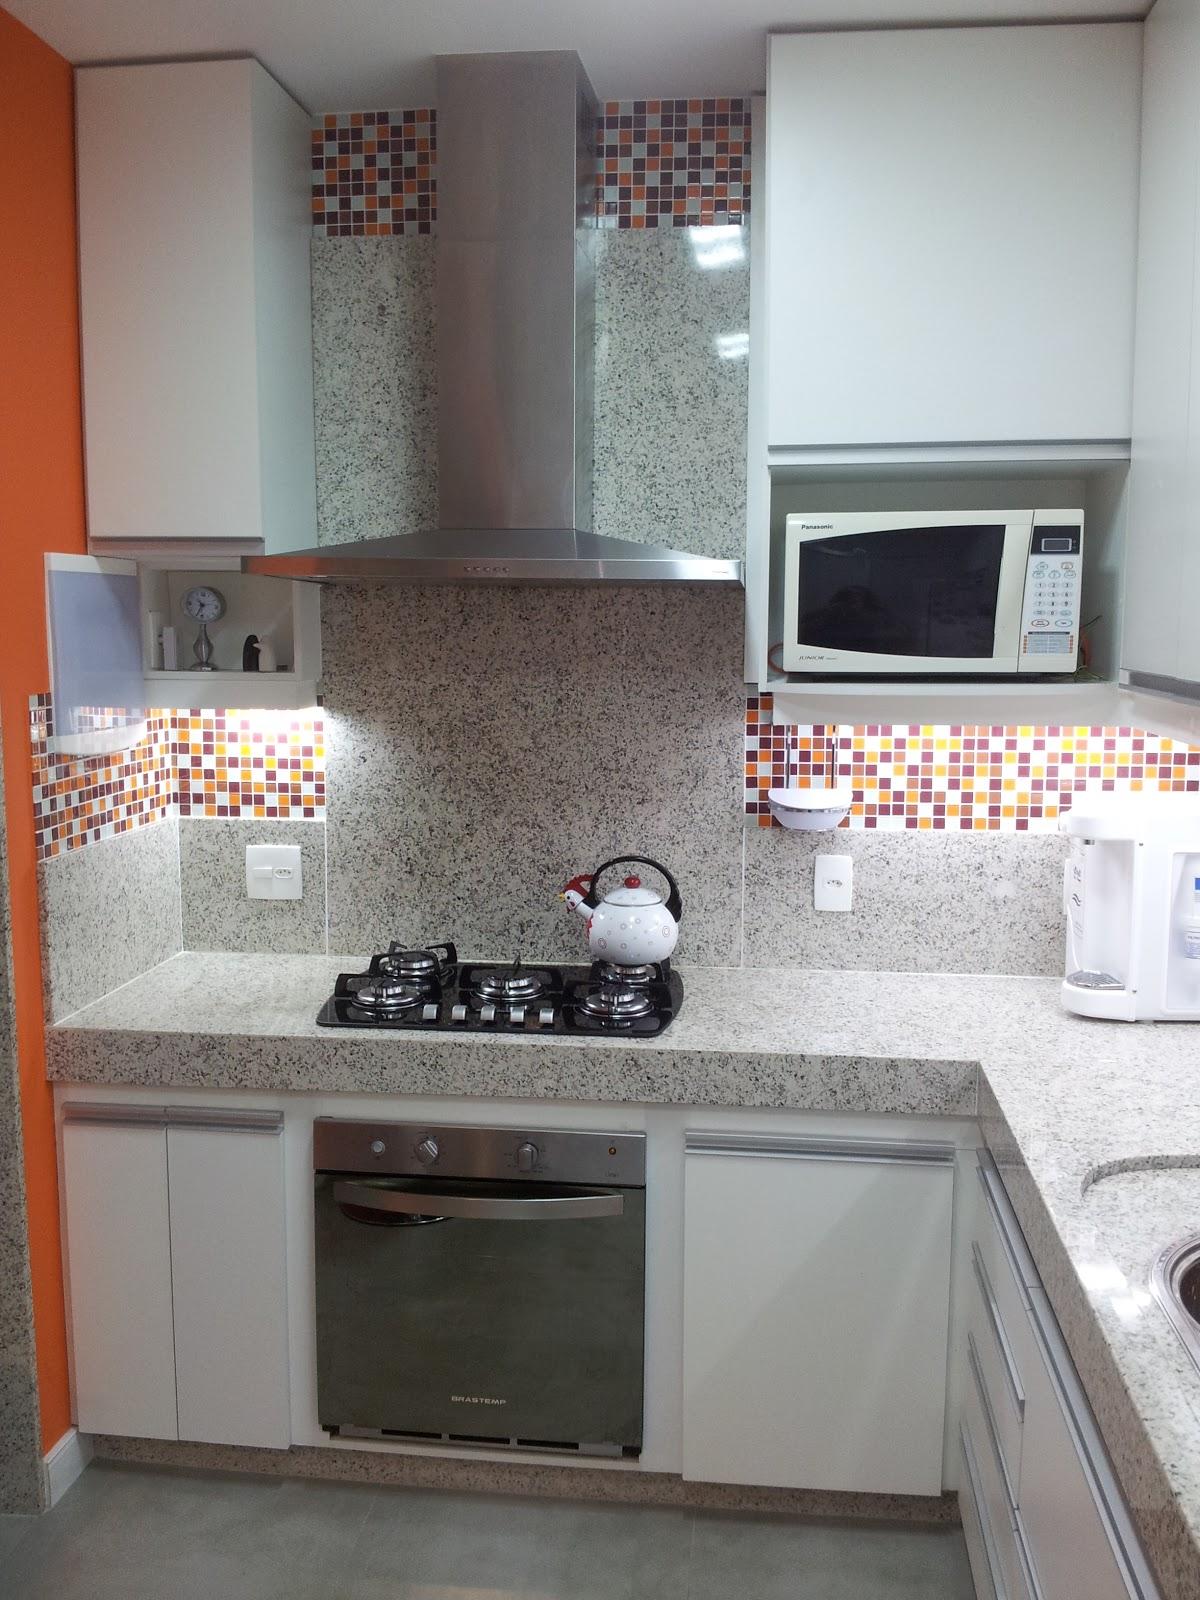 .blogspot.com/ ReginaSegura. arquitetura: Reforma de Cozinha Tijuca #A34A28 1200 1600